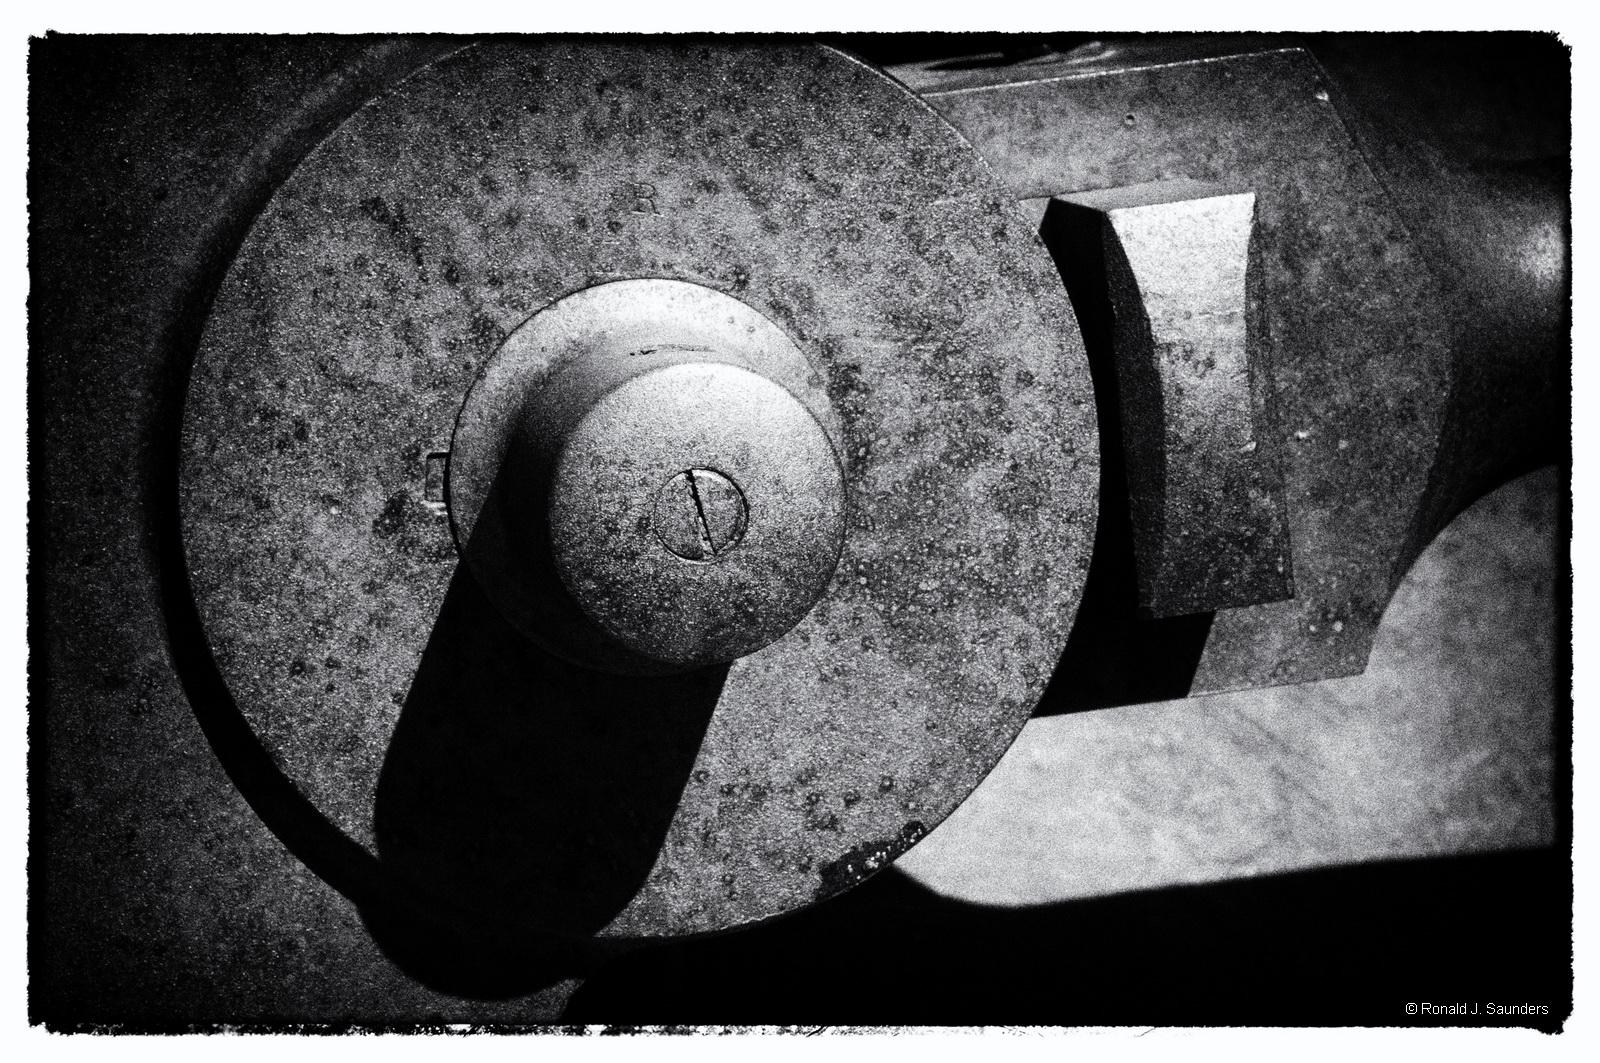 ronald, saunders, bodie, digital, fine art, ronald j, saunders, photography,Bodie California, Ronald J. Saunders, Iron a, photo